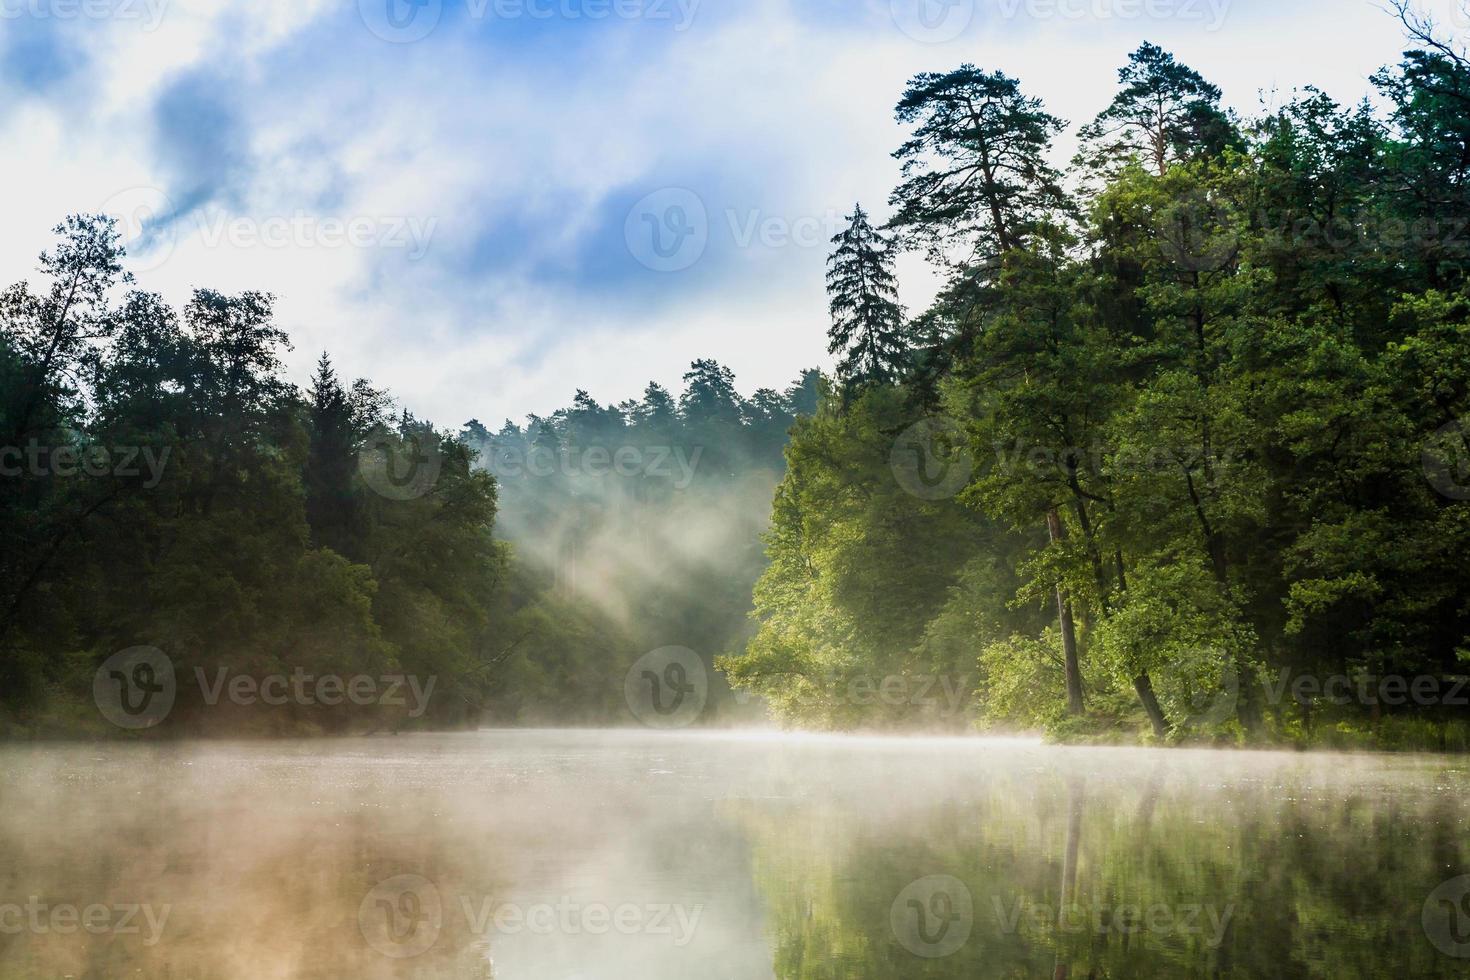 rivier łyna foto